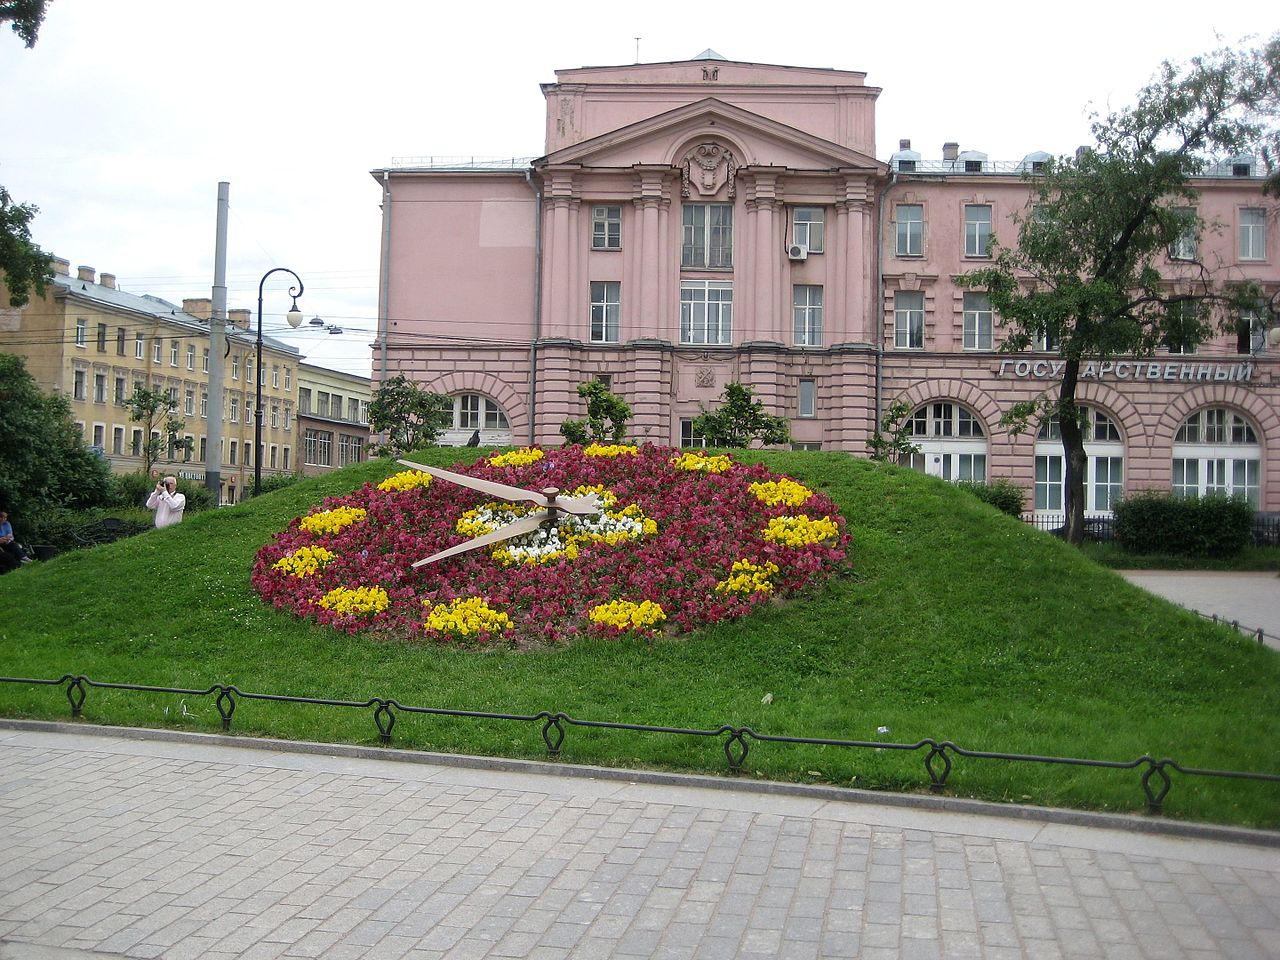 Швейцарская клумба-часы в Александровском парке